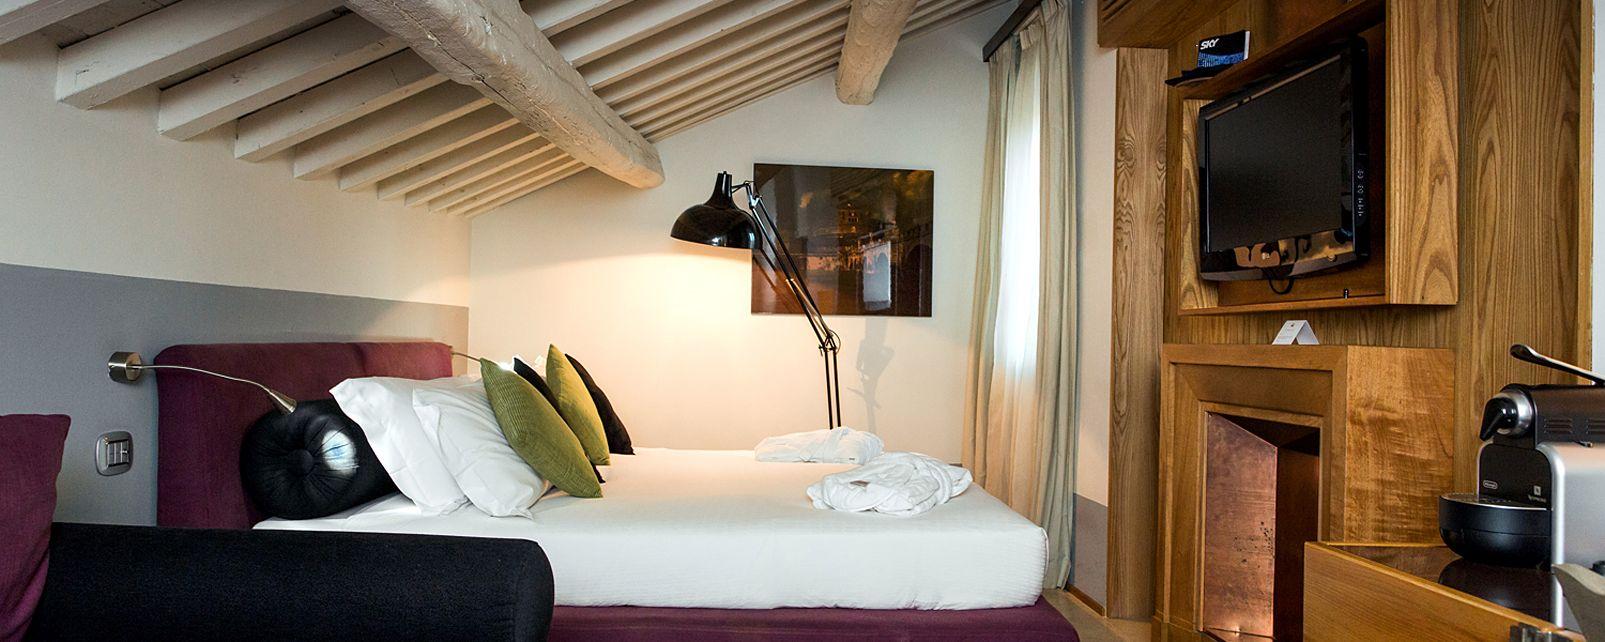 Hotel Mario De' Fiori 37